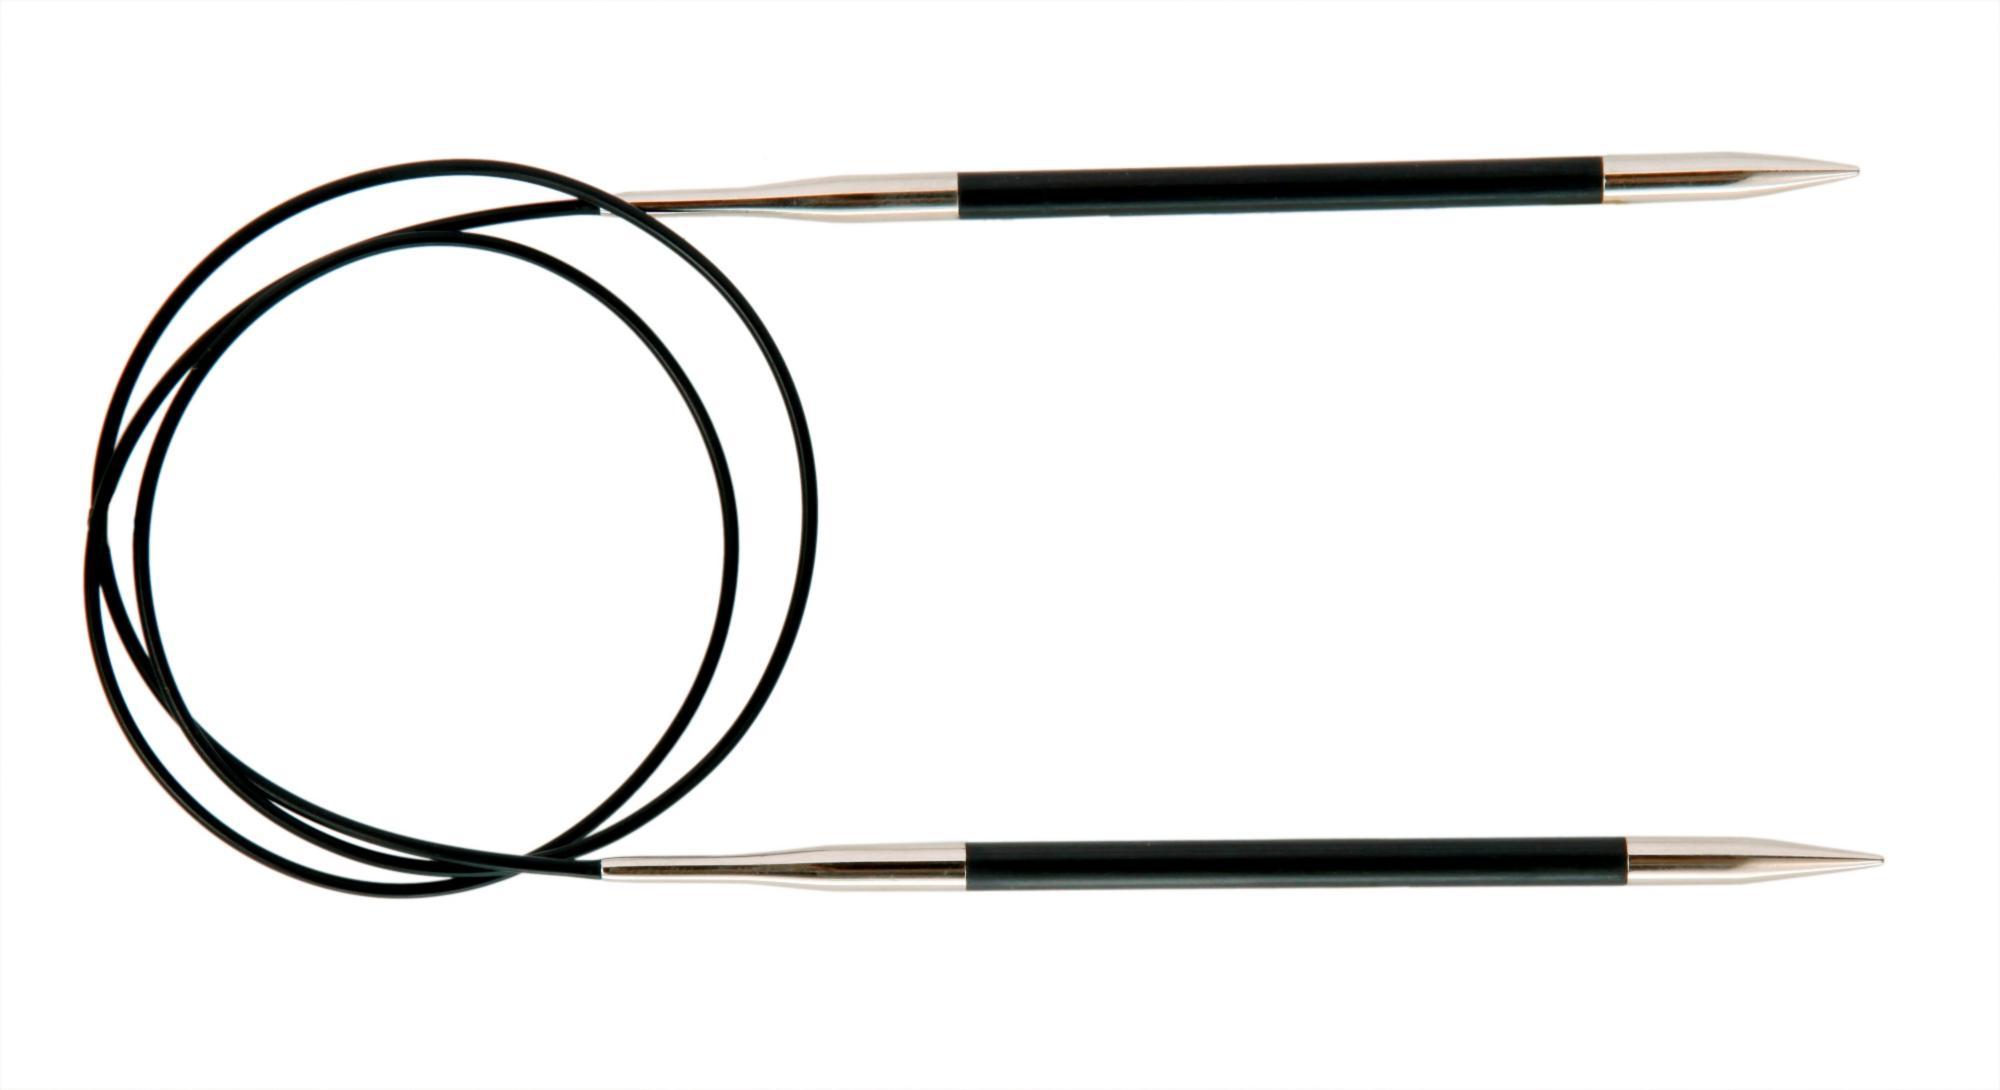 Спицы круговые 60 см Karbonz KnitPro, 41175, 8.00 мм